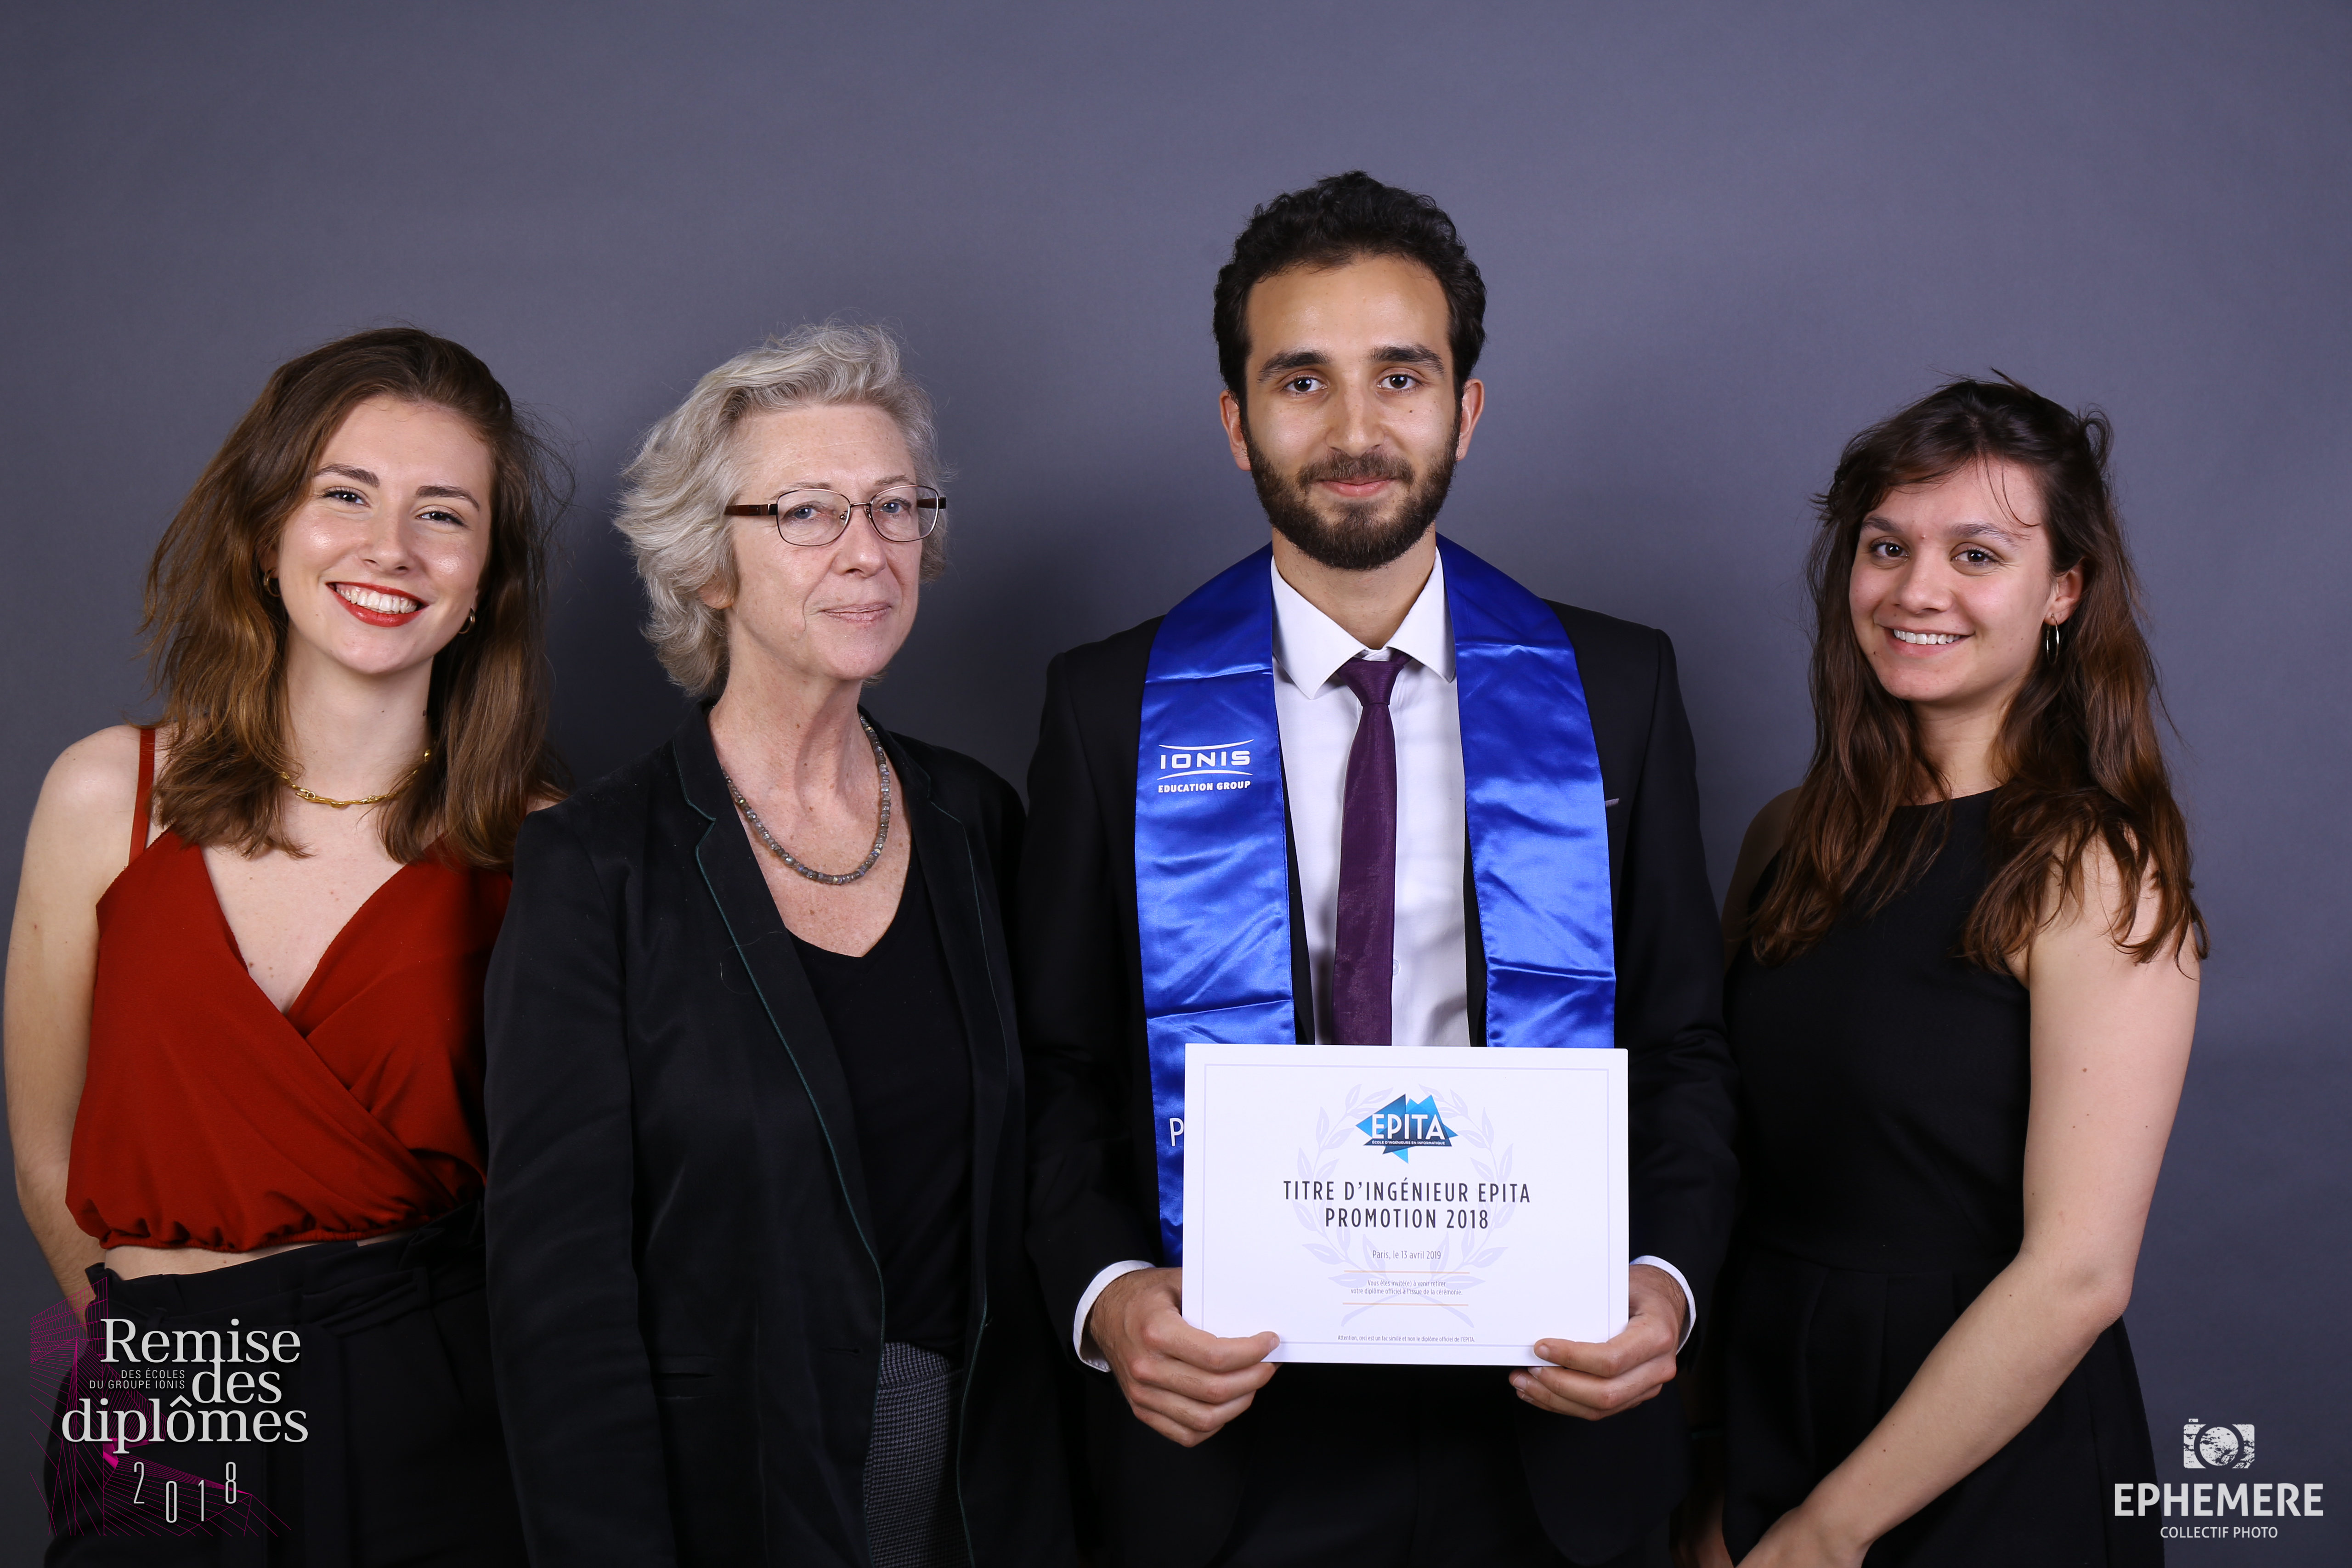 Remise des diplômes EPITA IPSA ESME SUDRIA 2018